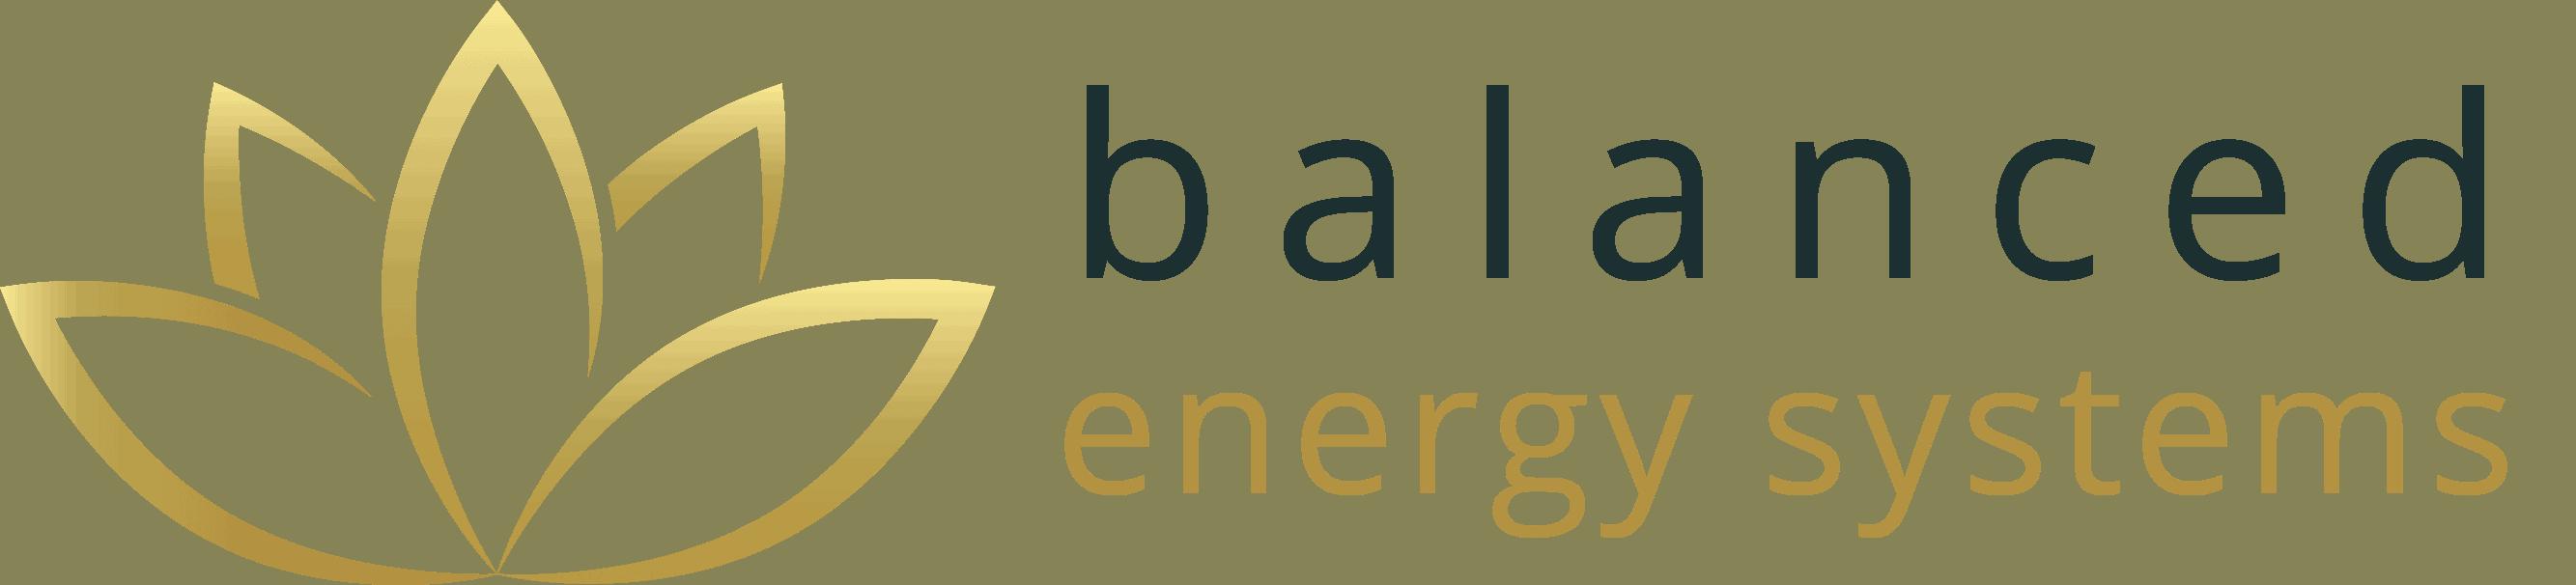 Balanced Energy Systems logo